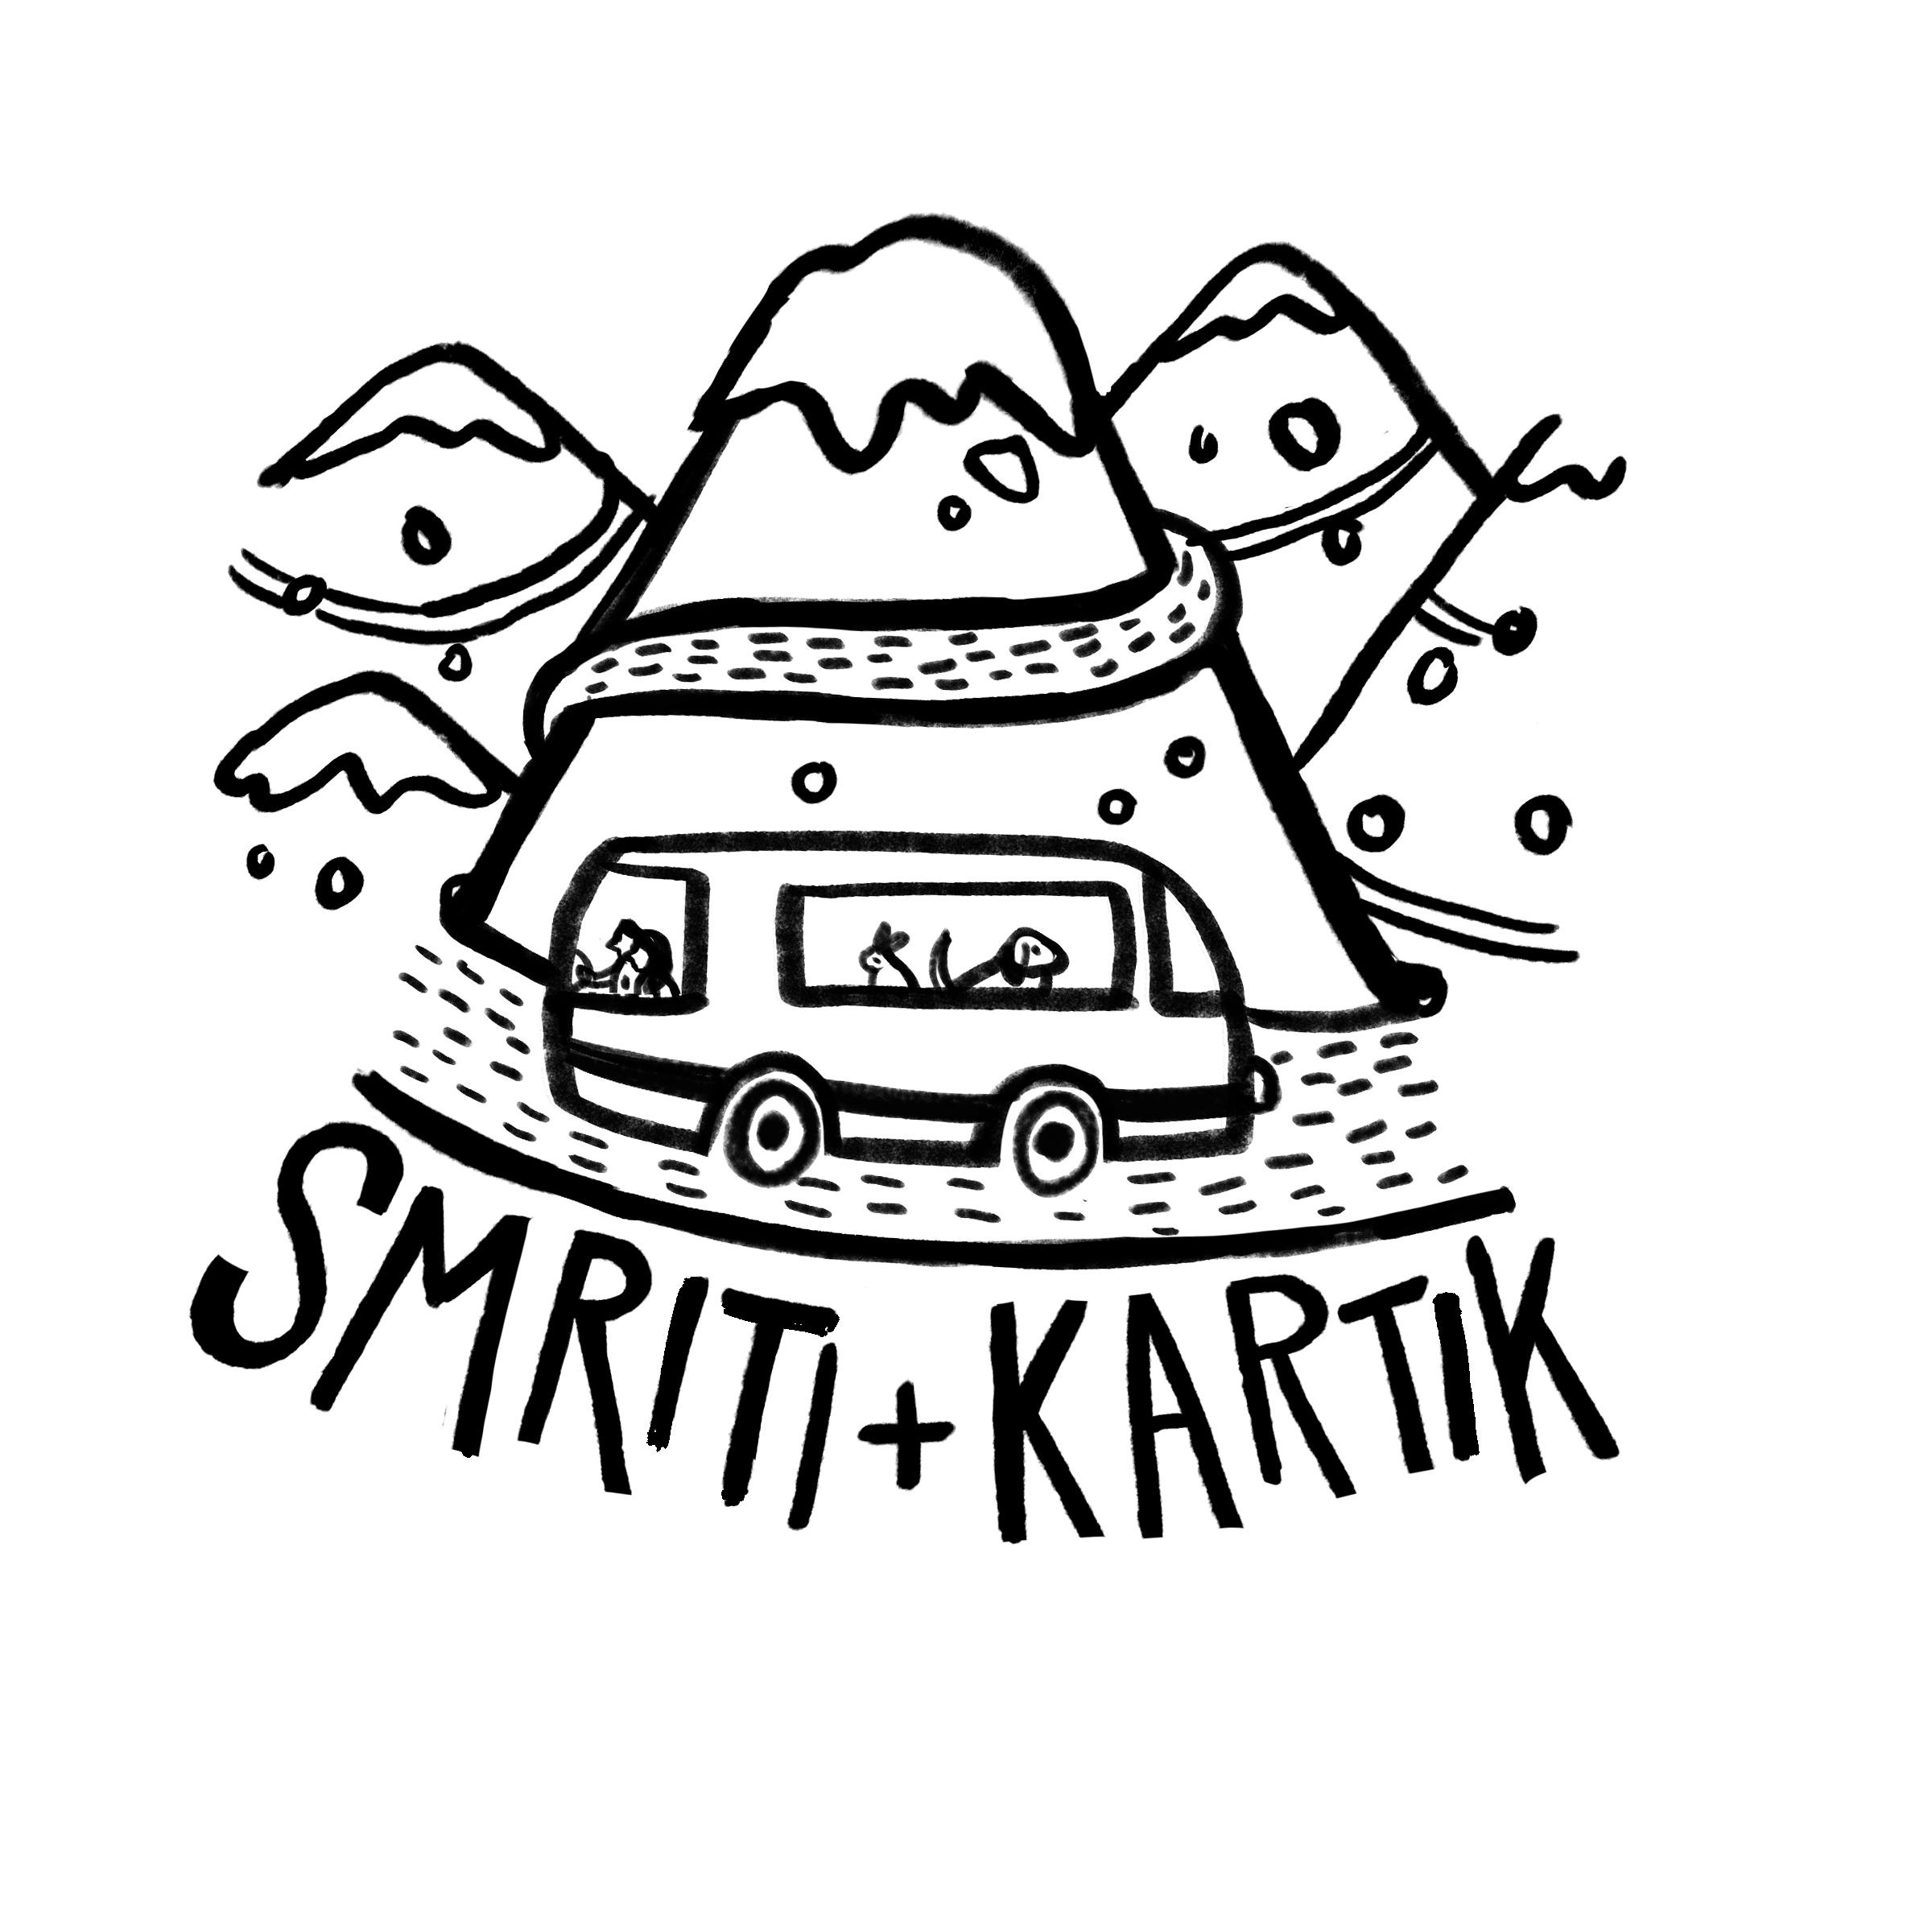 Logo chosen by Smriti and Kartik.